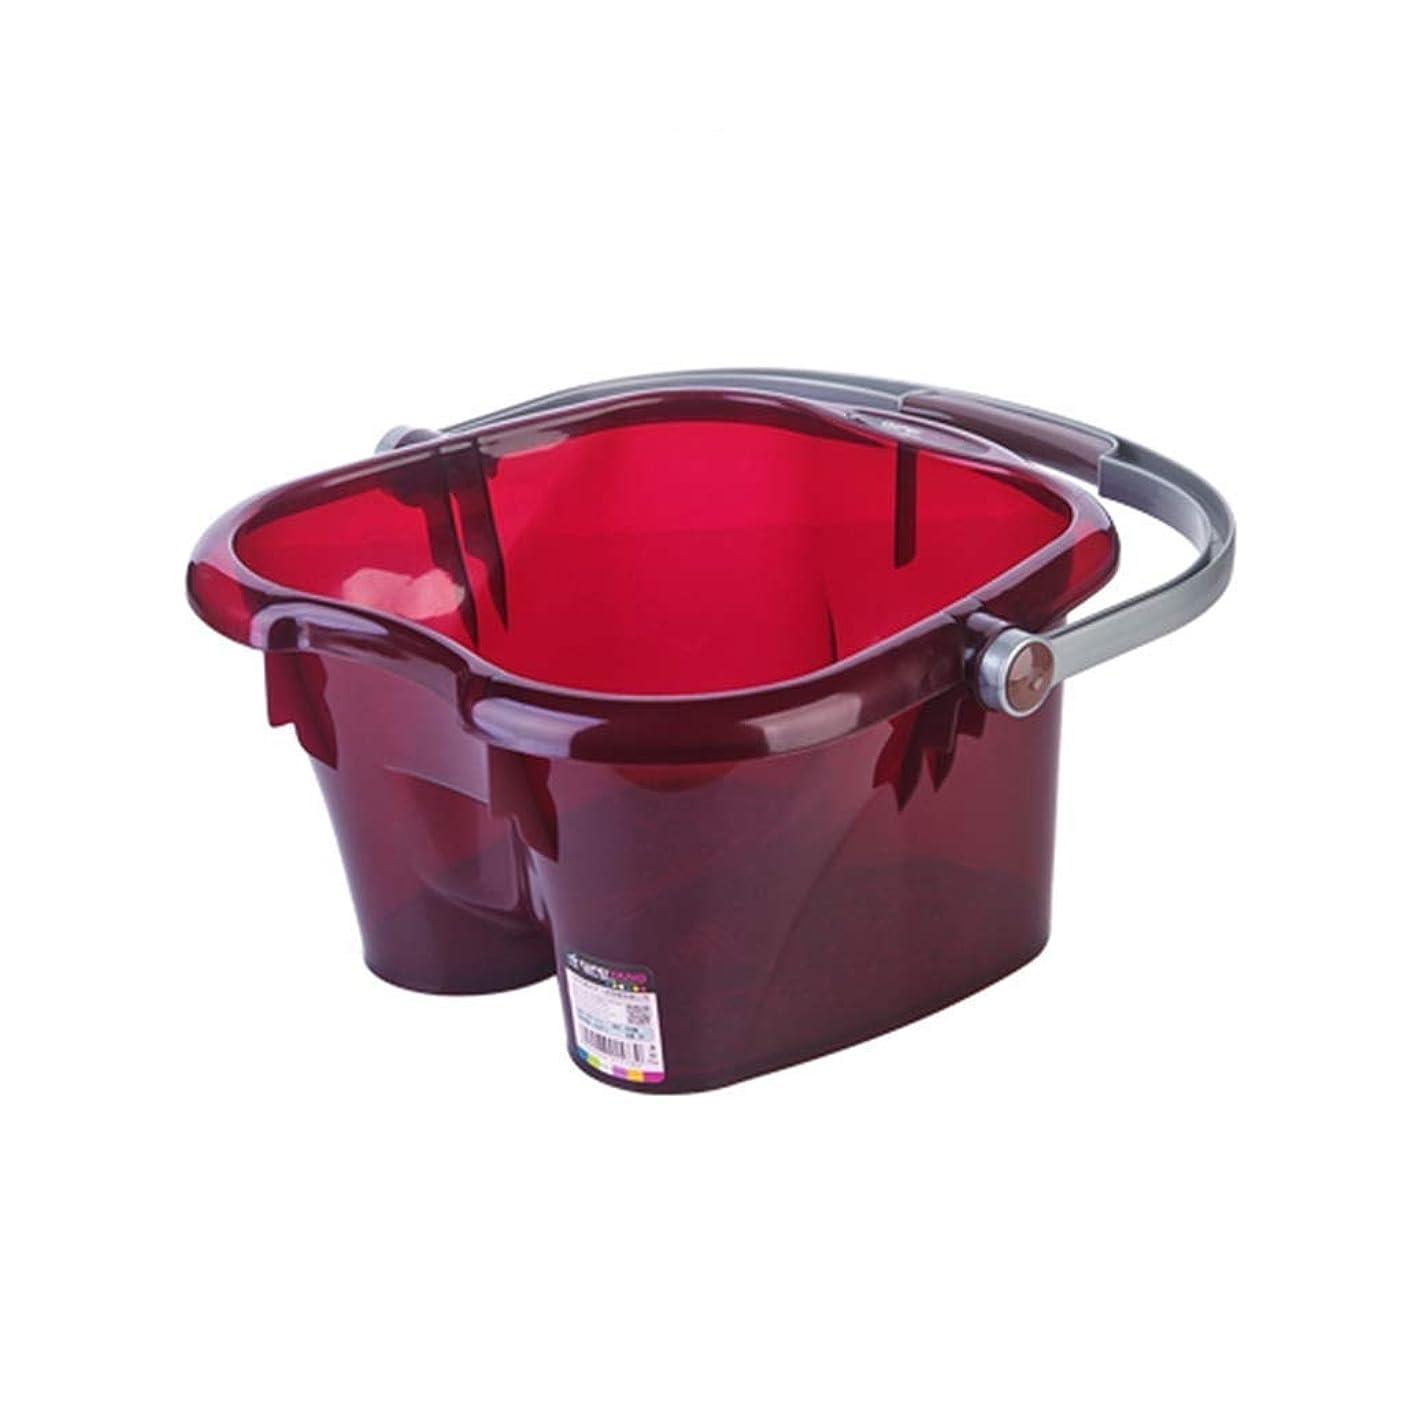 Kabi 北欧スタイルマッサージ浴槽ふたで洗うプラスチック足風呂樽洗浄バケツ健康ギフト XM1209-9-3-10 (Color : Red)